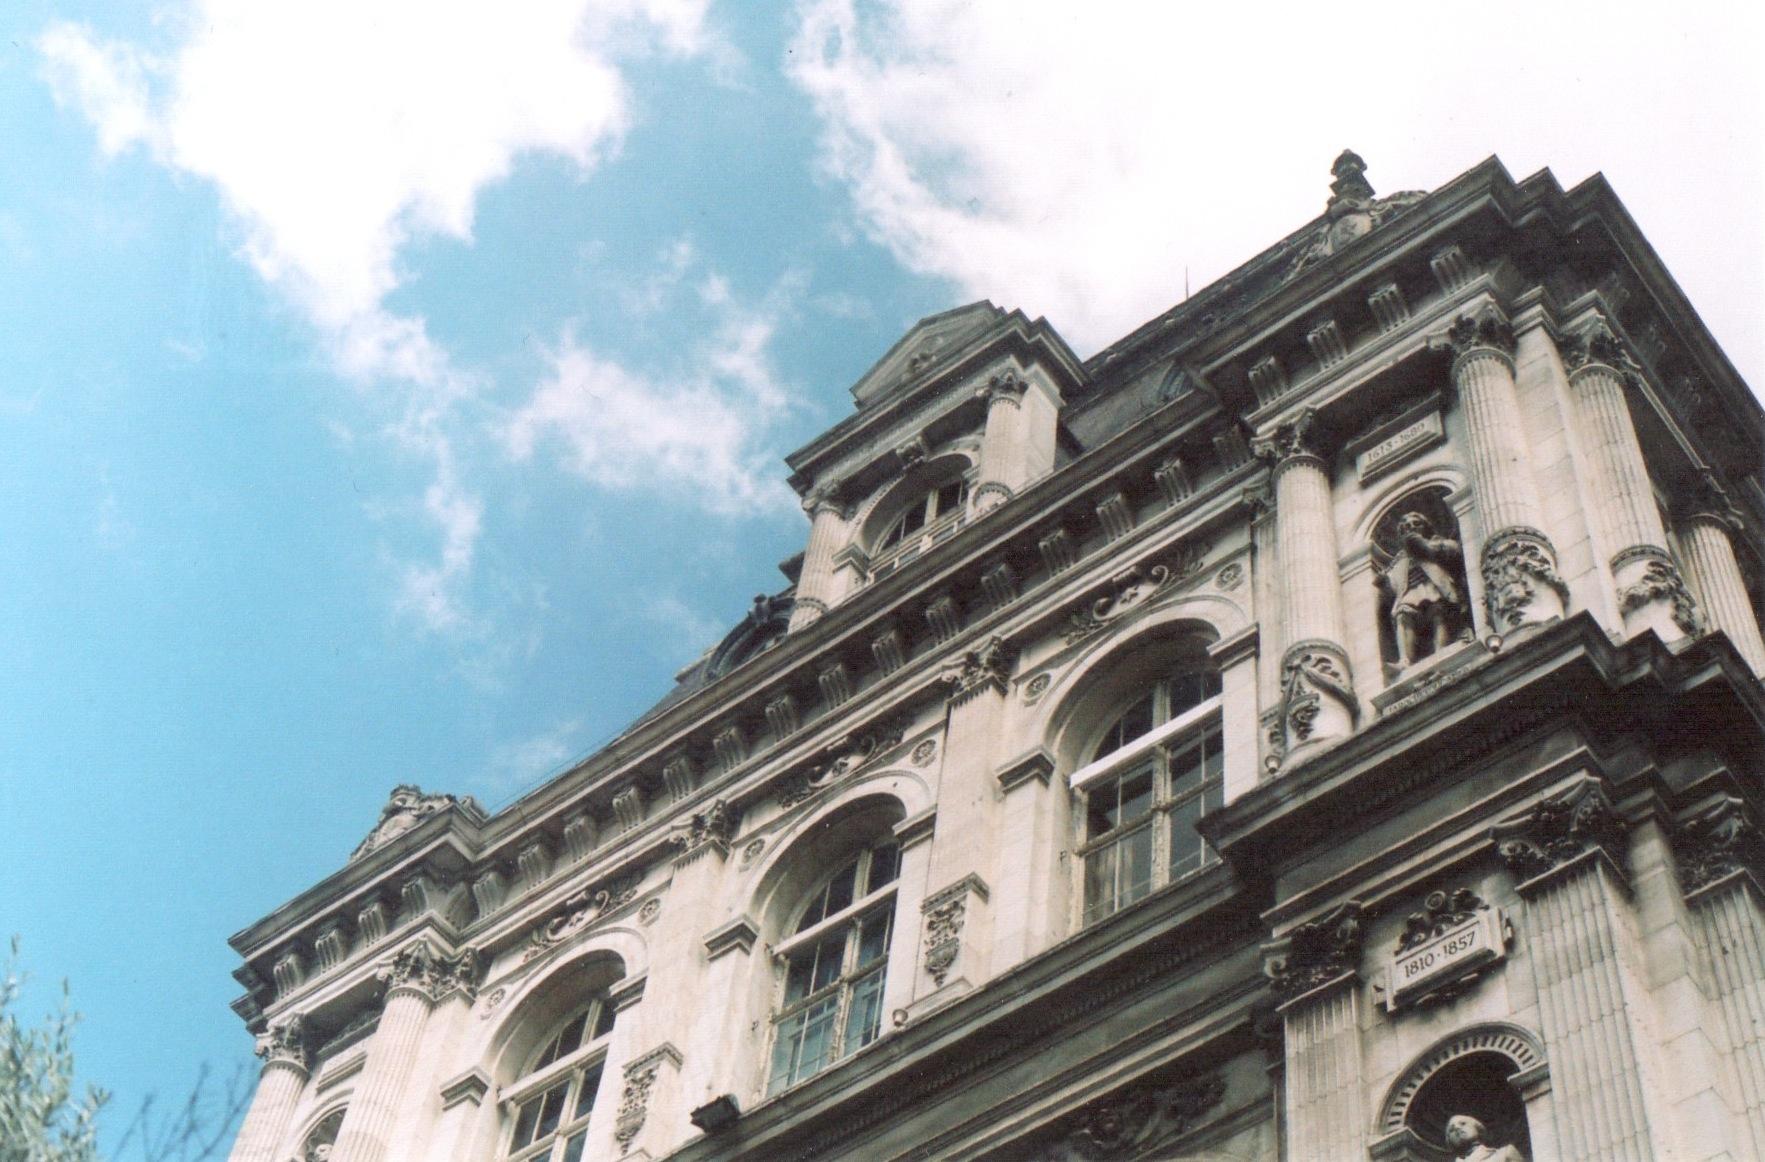 Streets of Paris on Film I